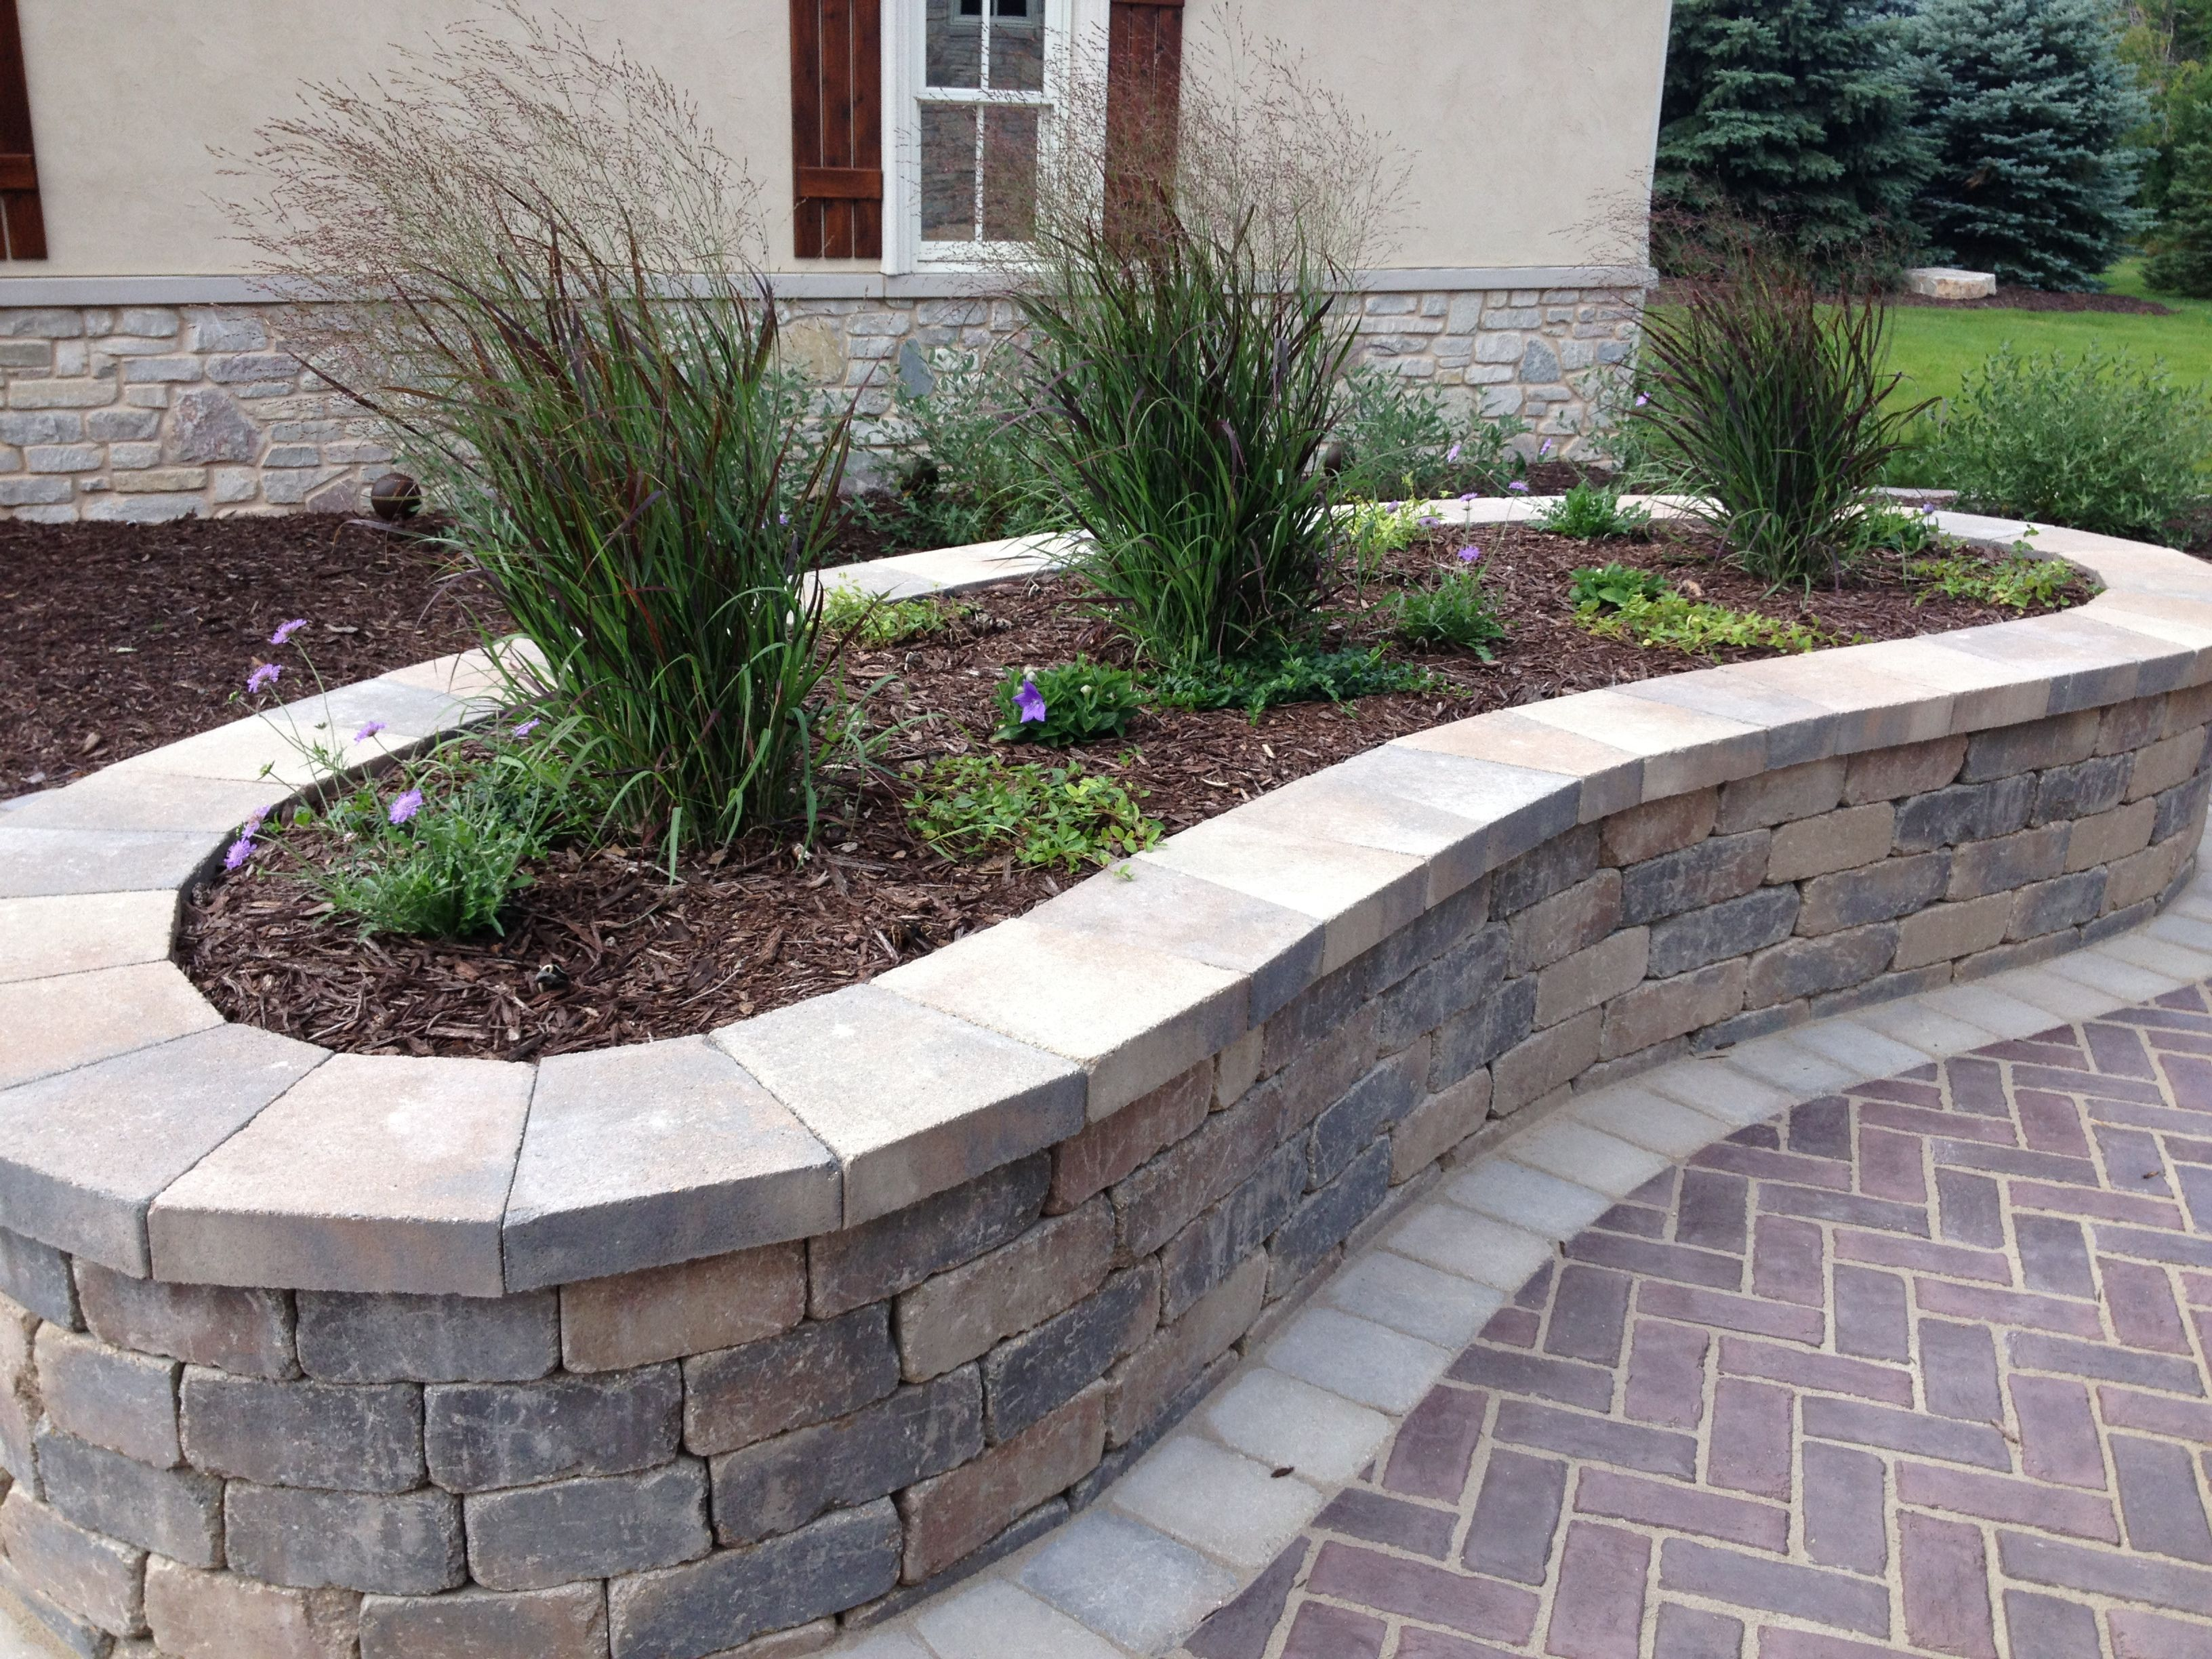 Kidney Bean Shaped Planting Bed Front Yard Landscaping Design